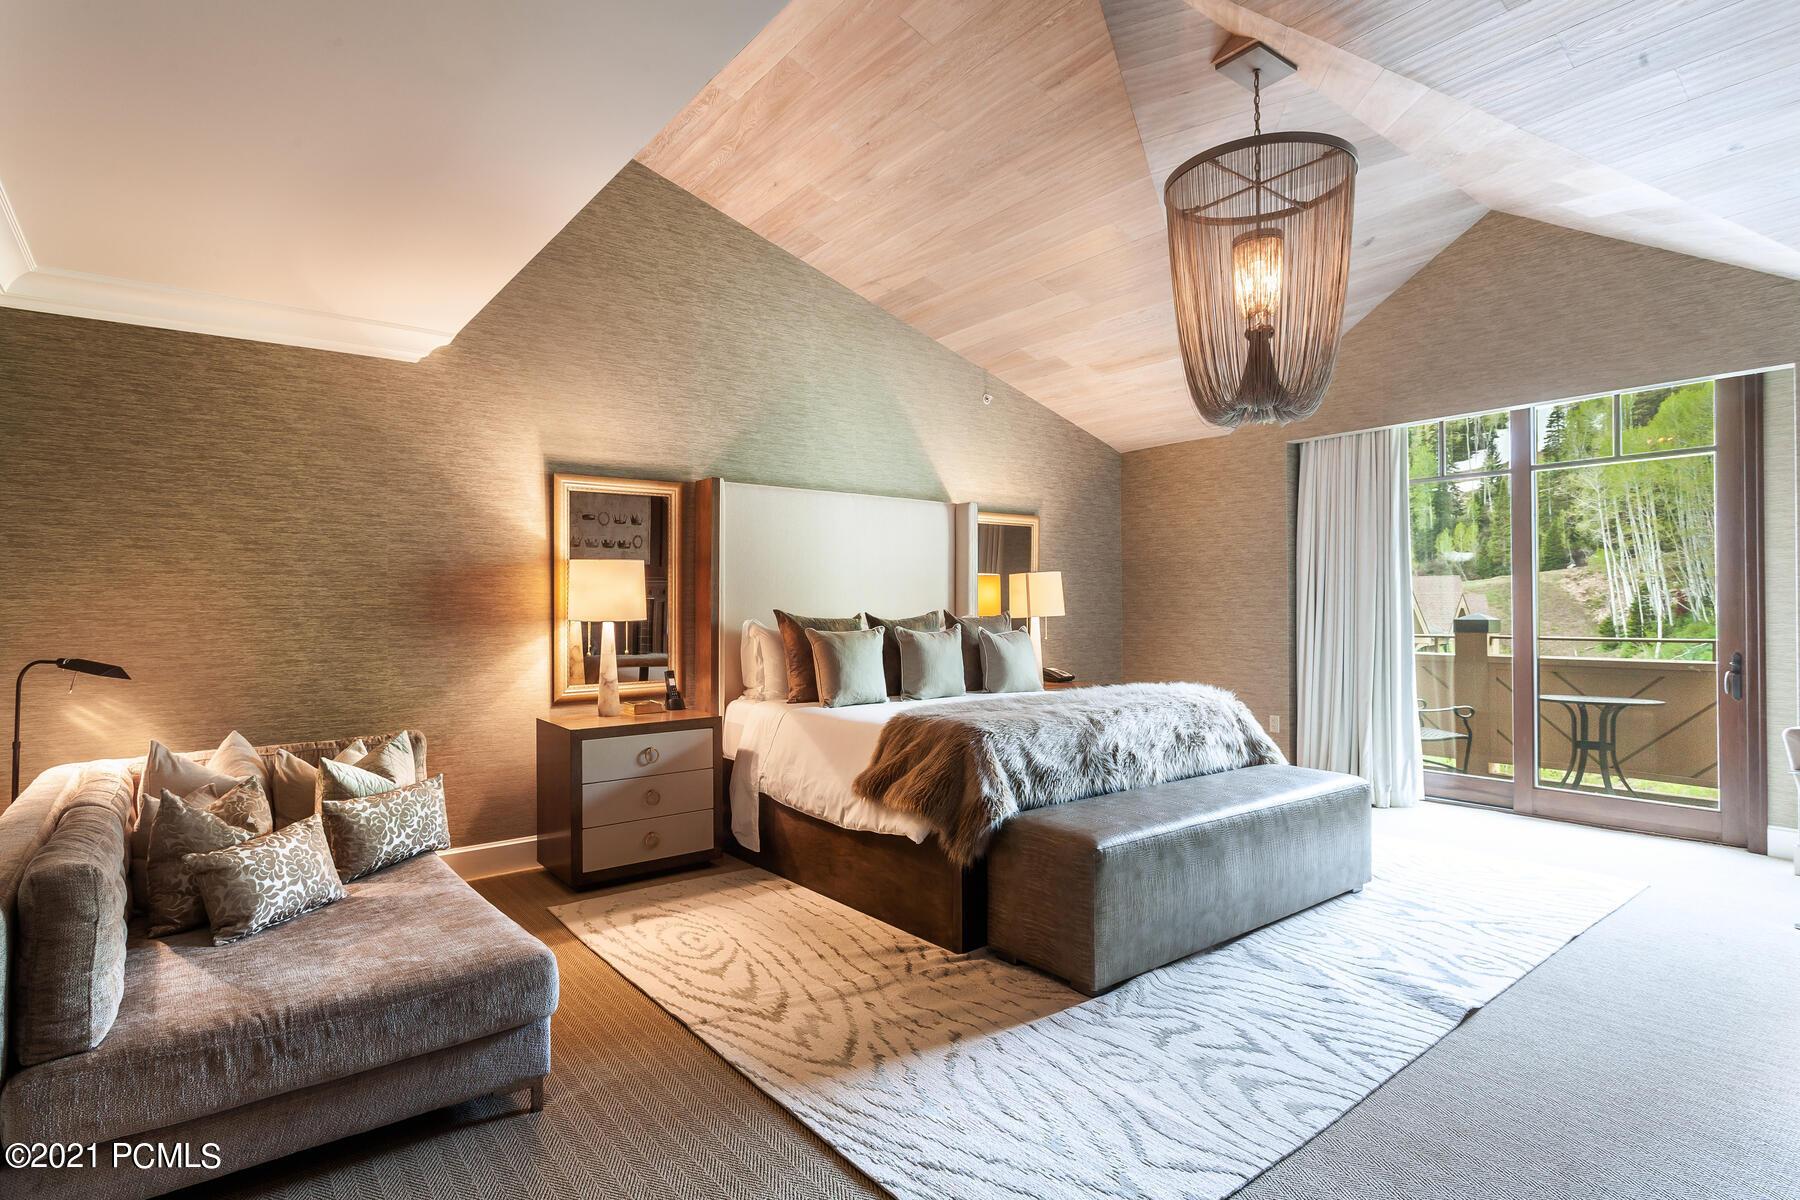 9100 Marsac Avenue, Park City, Utah 84060, 4 Bedrooms Bedrooms, ,4 BathroomsBathrooms,Condominium,For Sale,Marsac,12002472